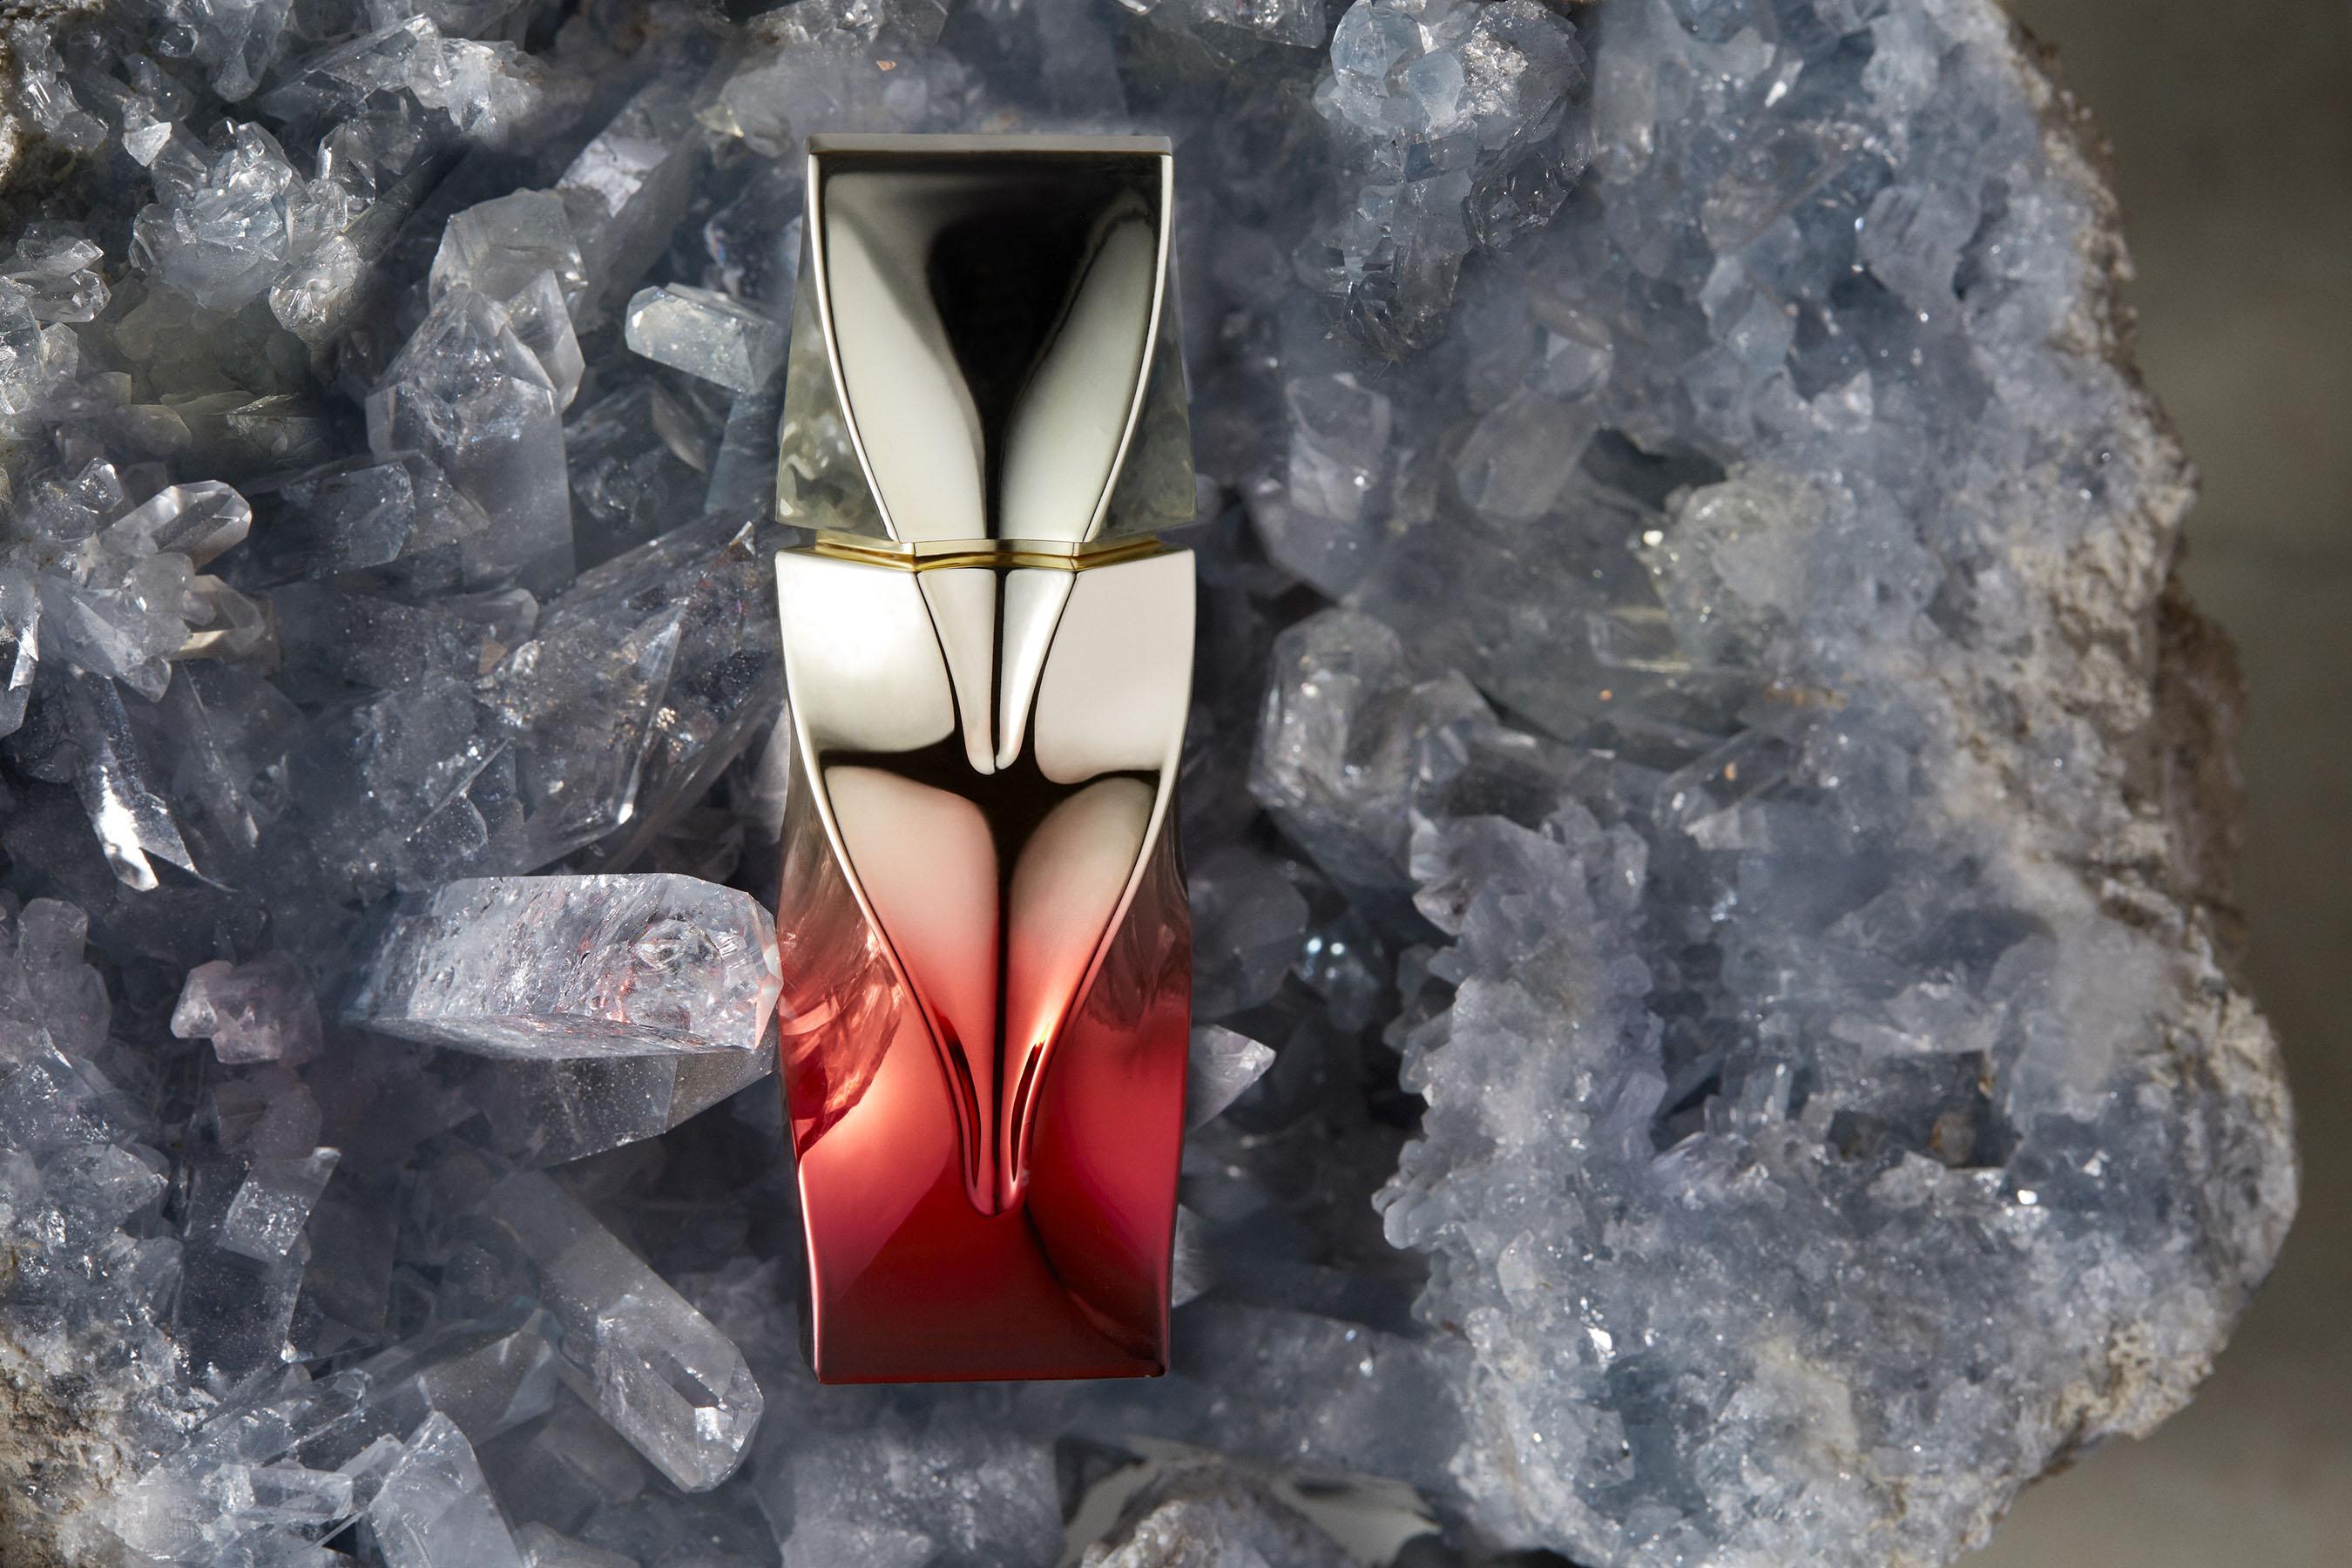 christian-louboutin-perfume-oil-tornade-blonde-bottle-shot